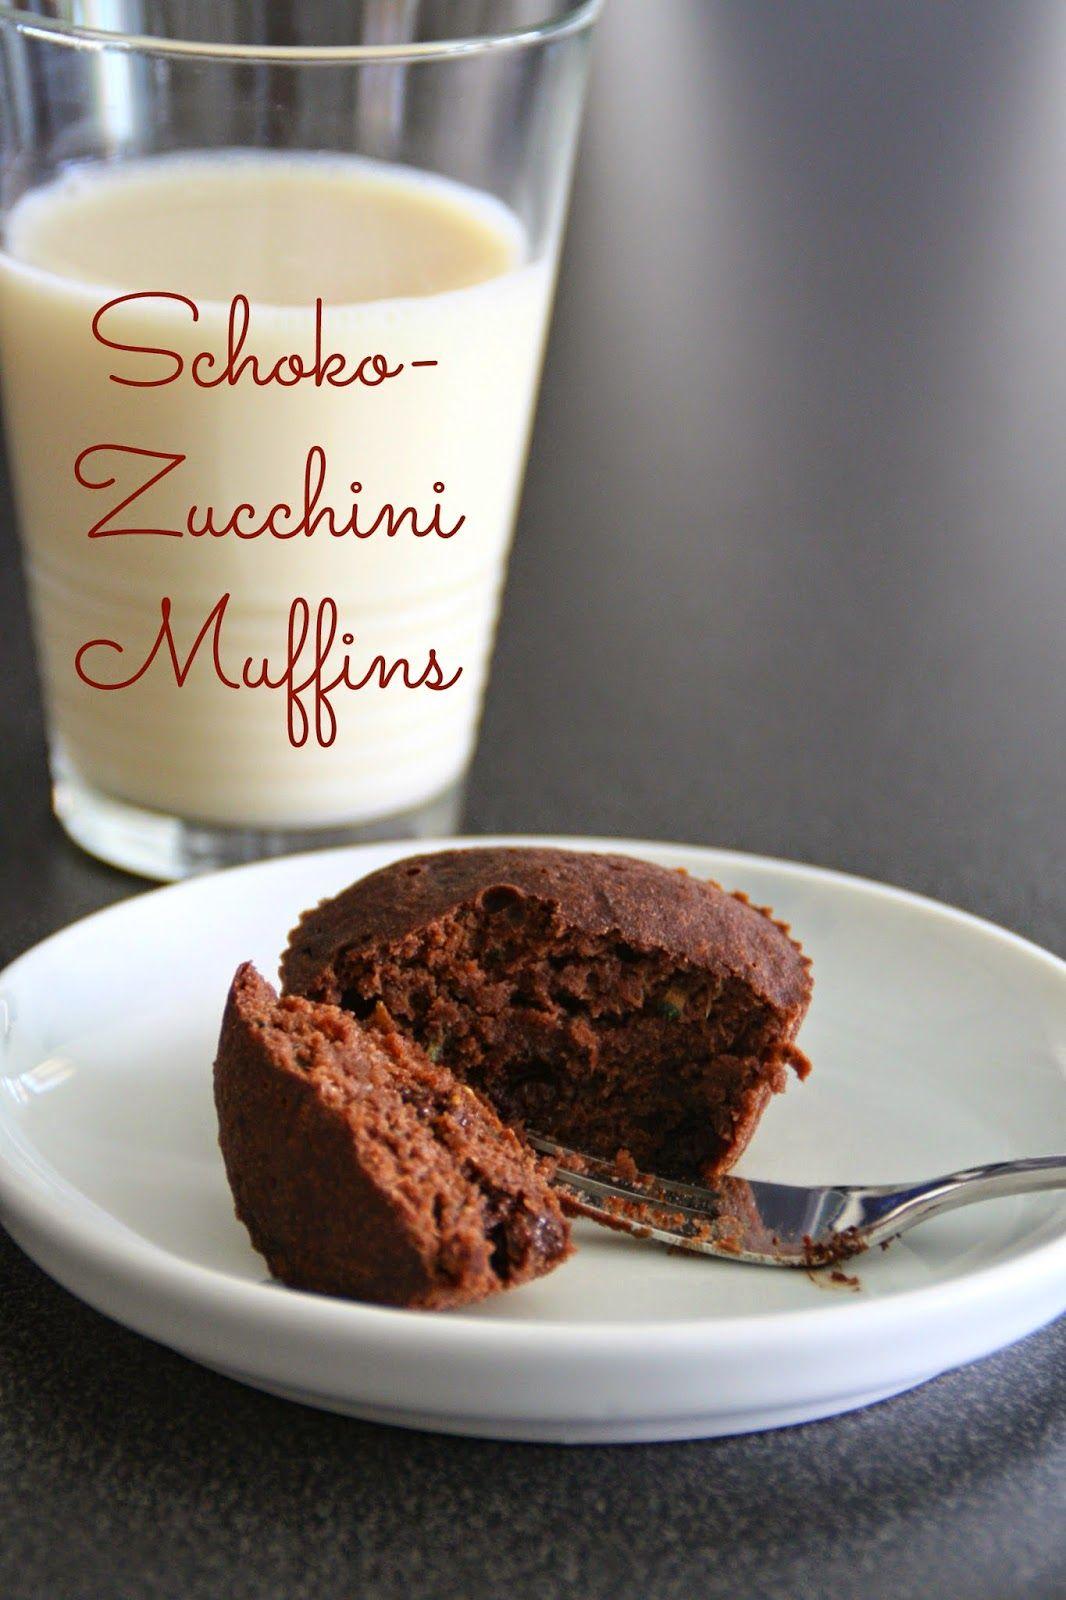 Schoko Zucchini Muffins Sweets Pinterest Zucchini Schoko Und